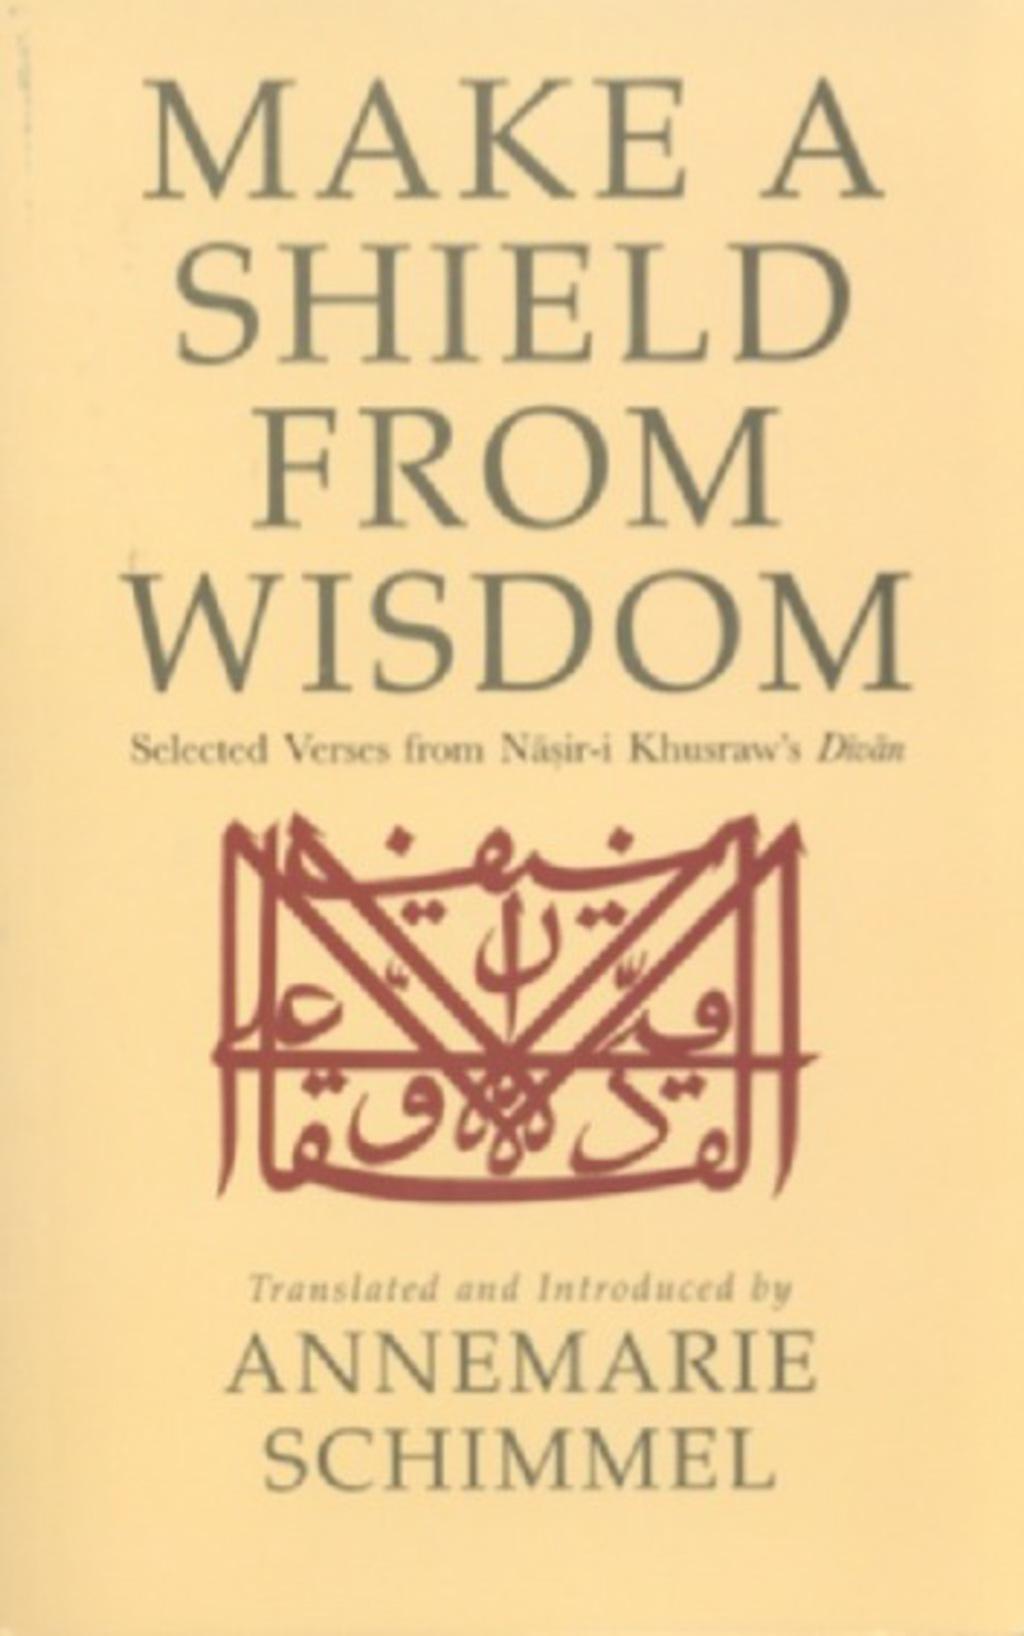 Make A Shield From Wisdom (ebook)